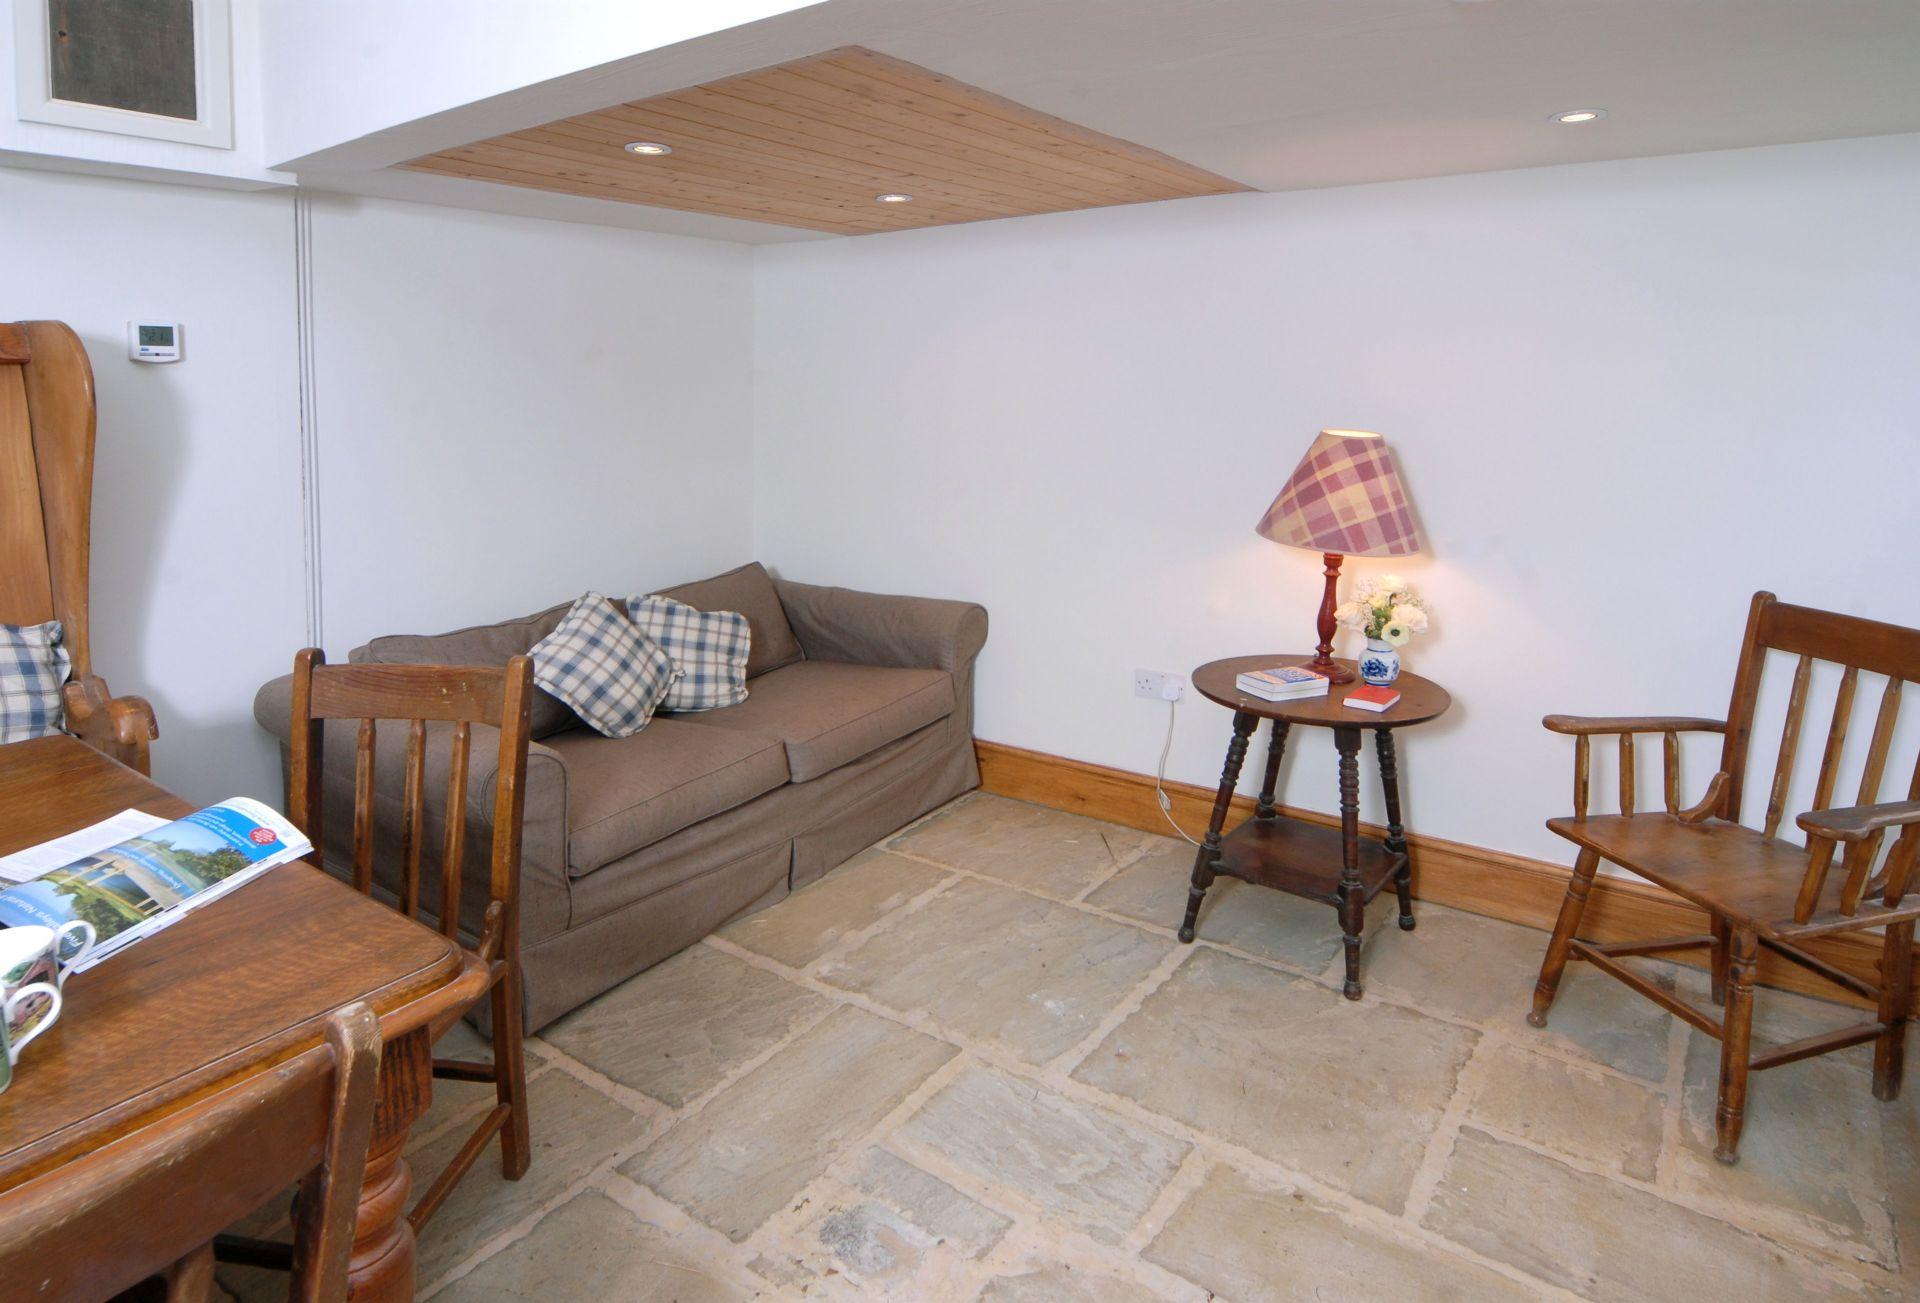 Watery Park Barn Ground floor:  Garden room with dining area